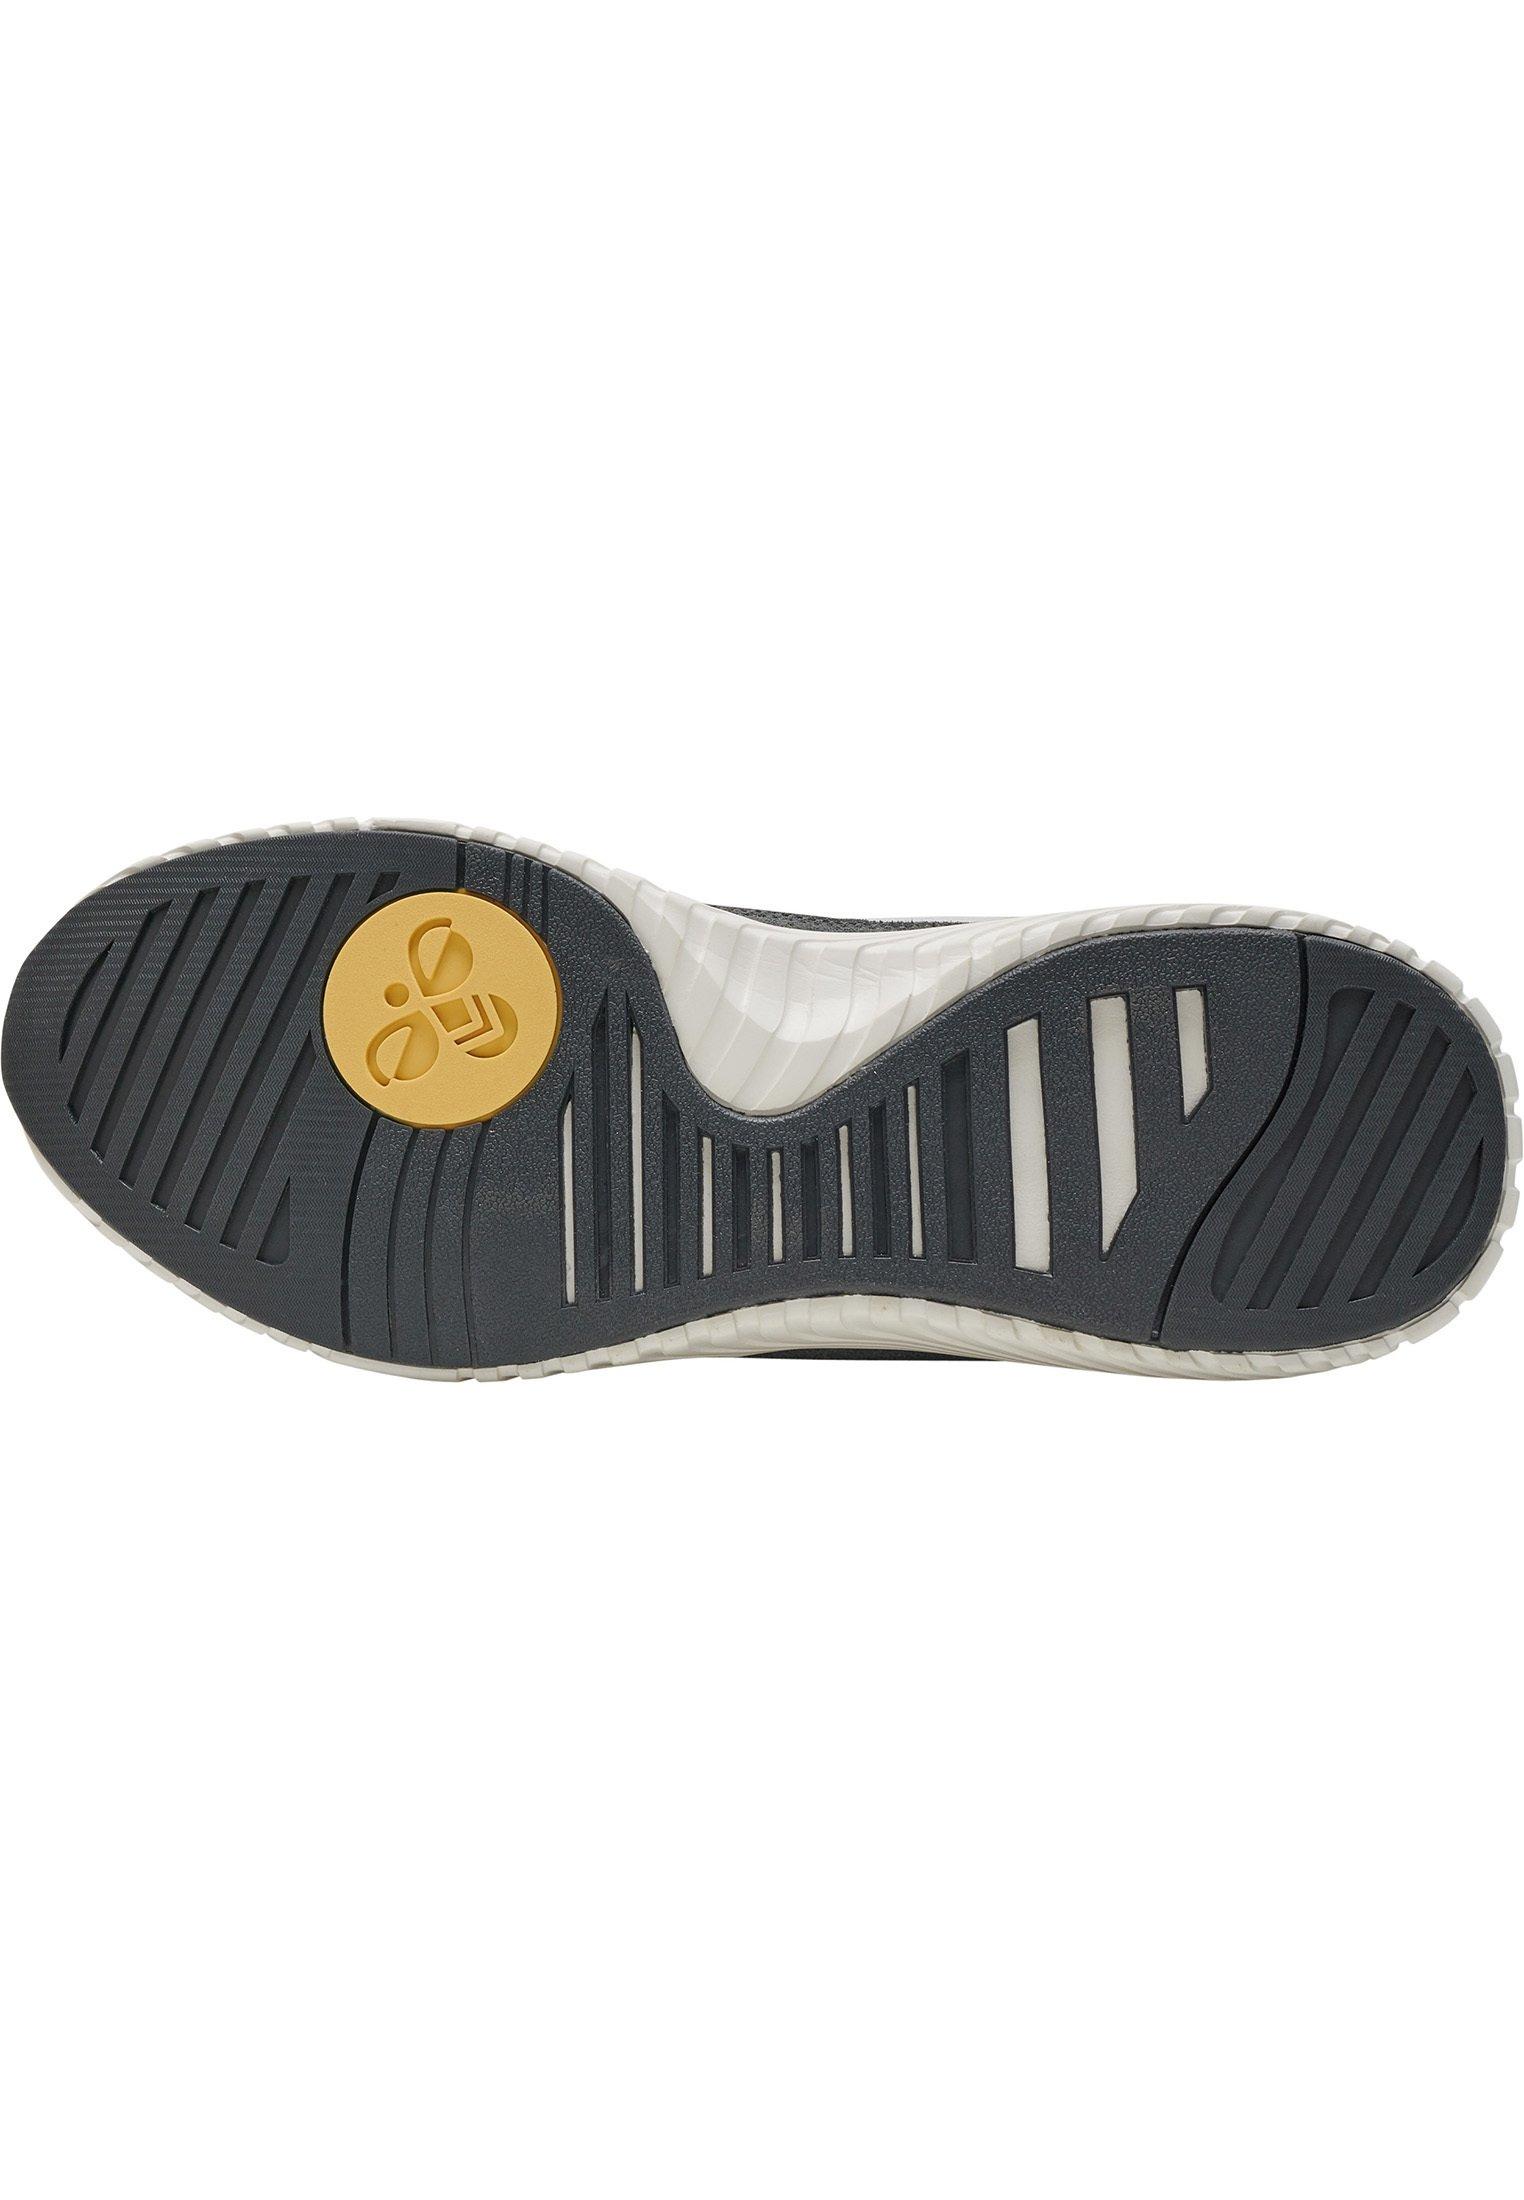 Hummel Sneaker low - magnet/grau - Herrenschuhe DJHUm